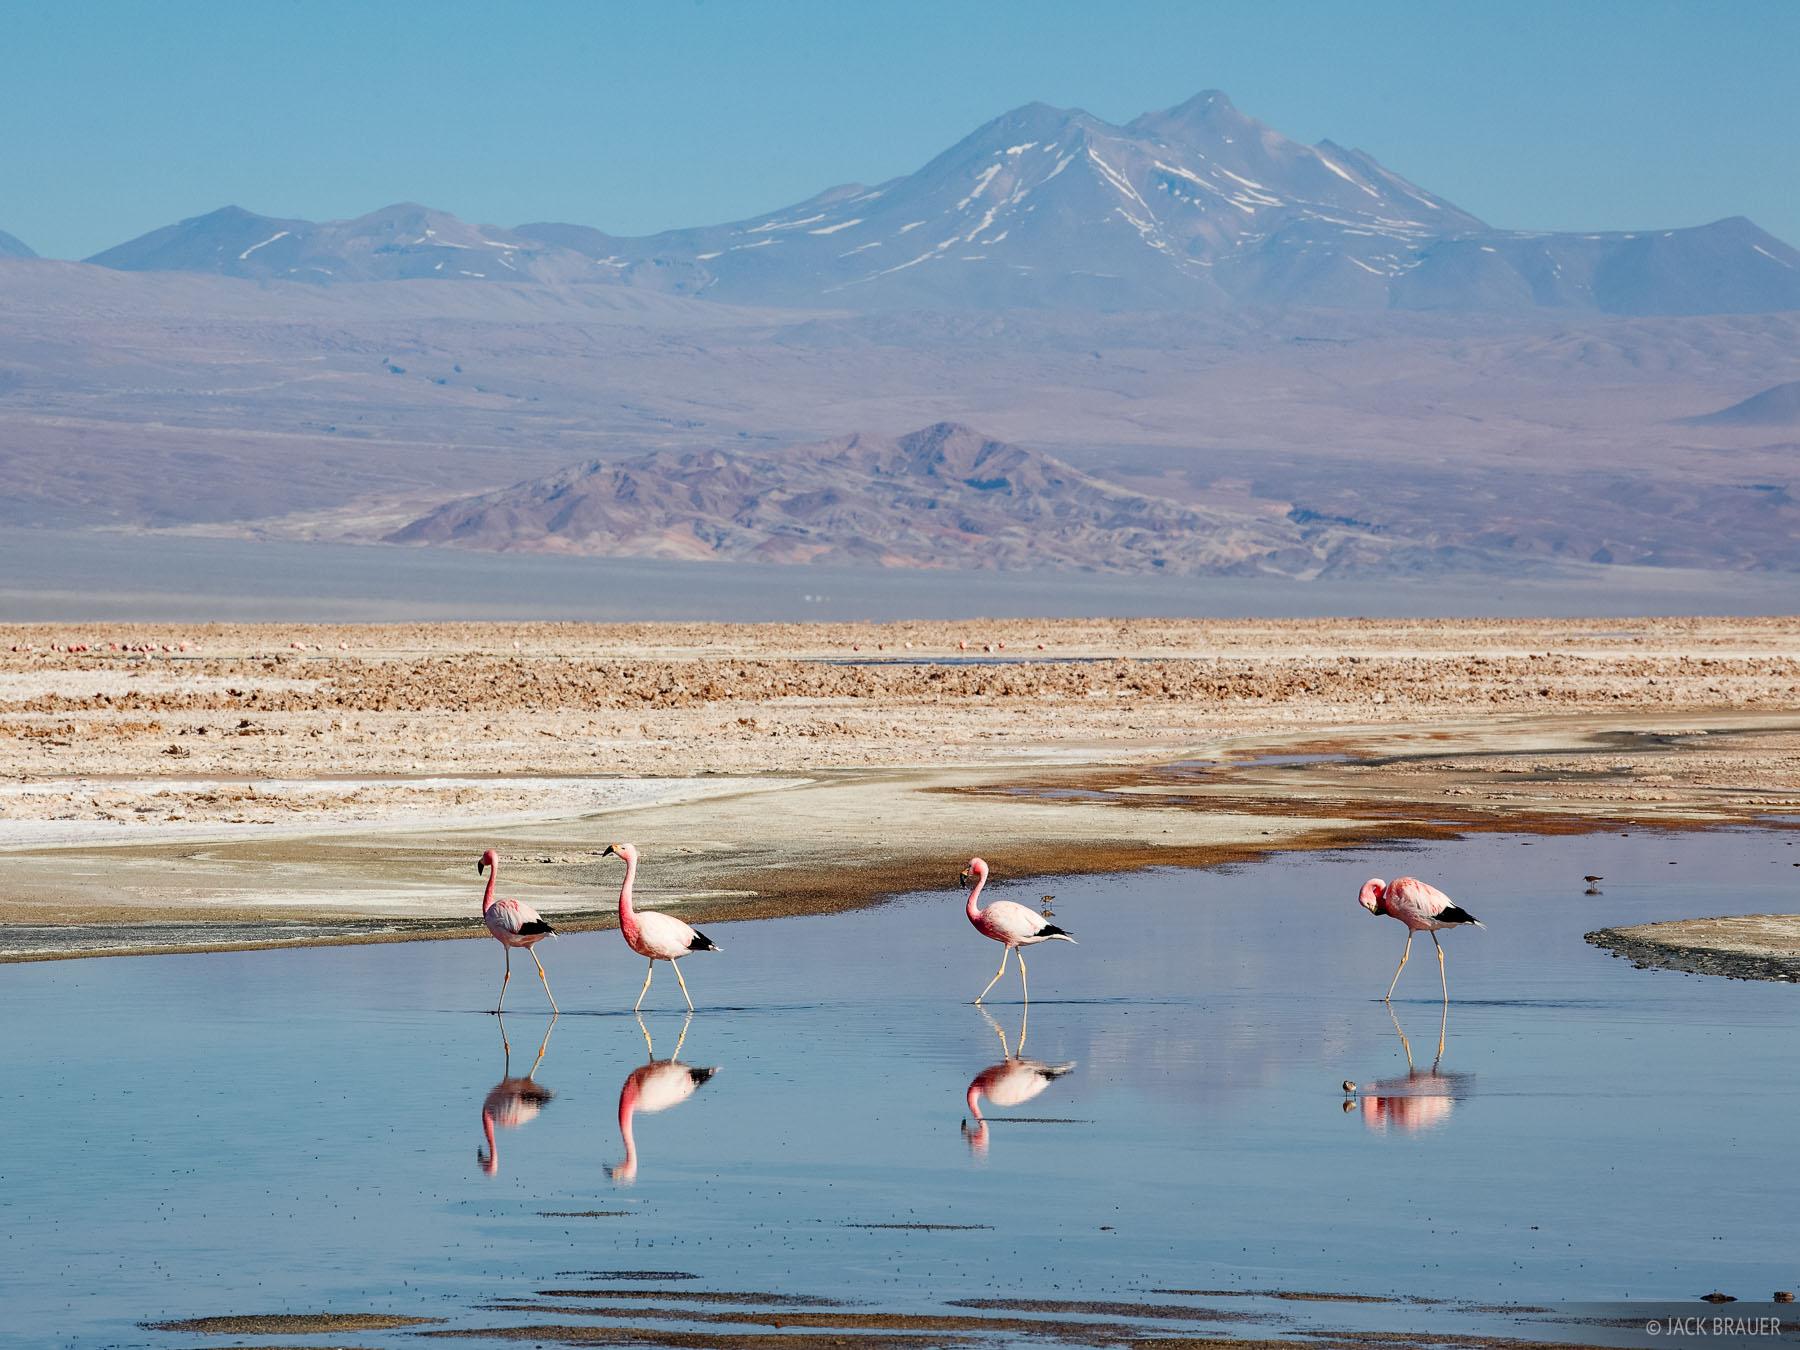 Flamingos at Laguna Chaxa in the Salar de Atacama giant salt flat near San Pedro de Atacama.